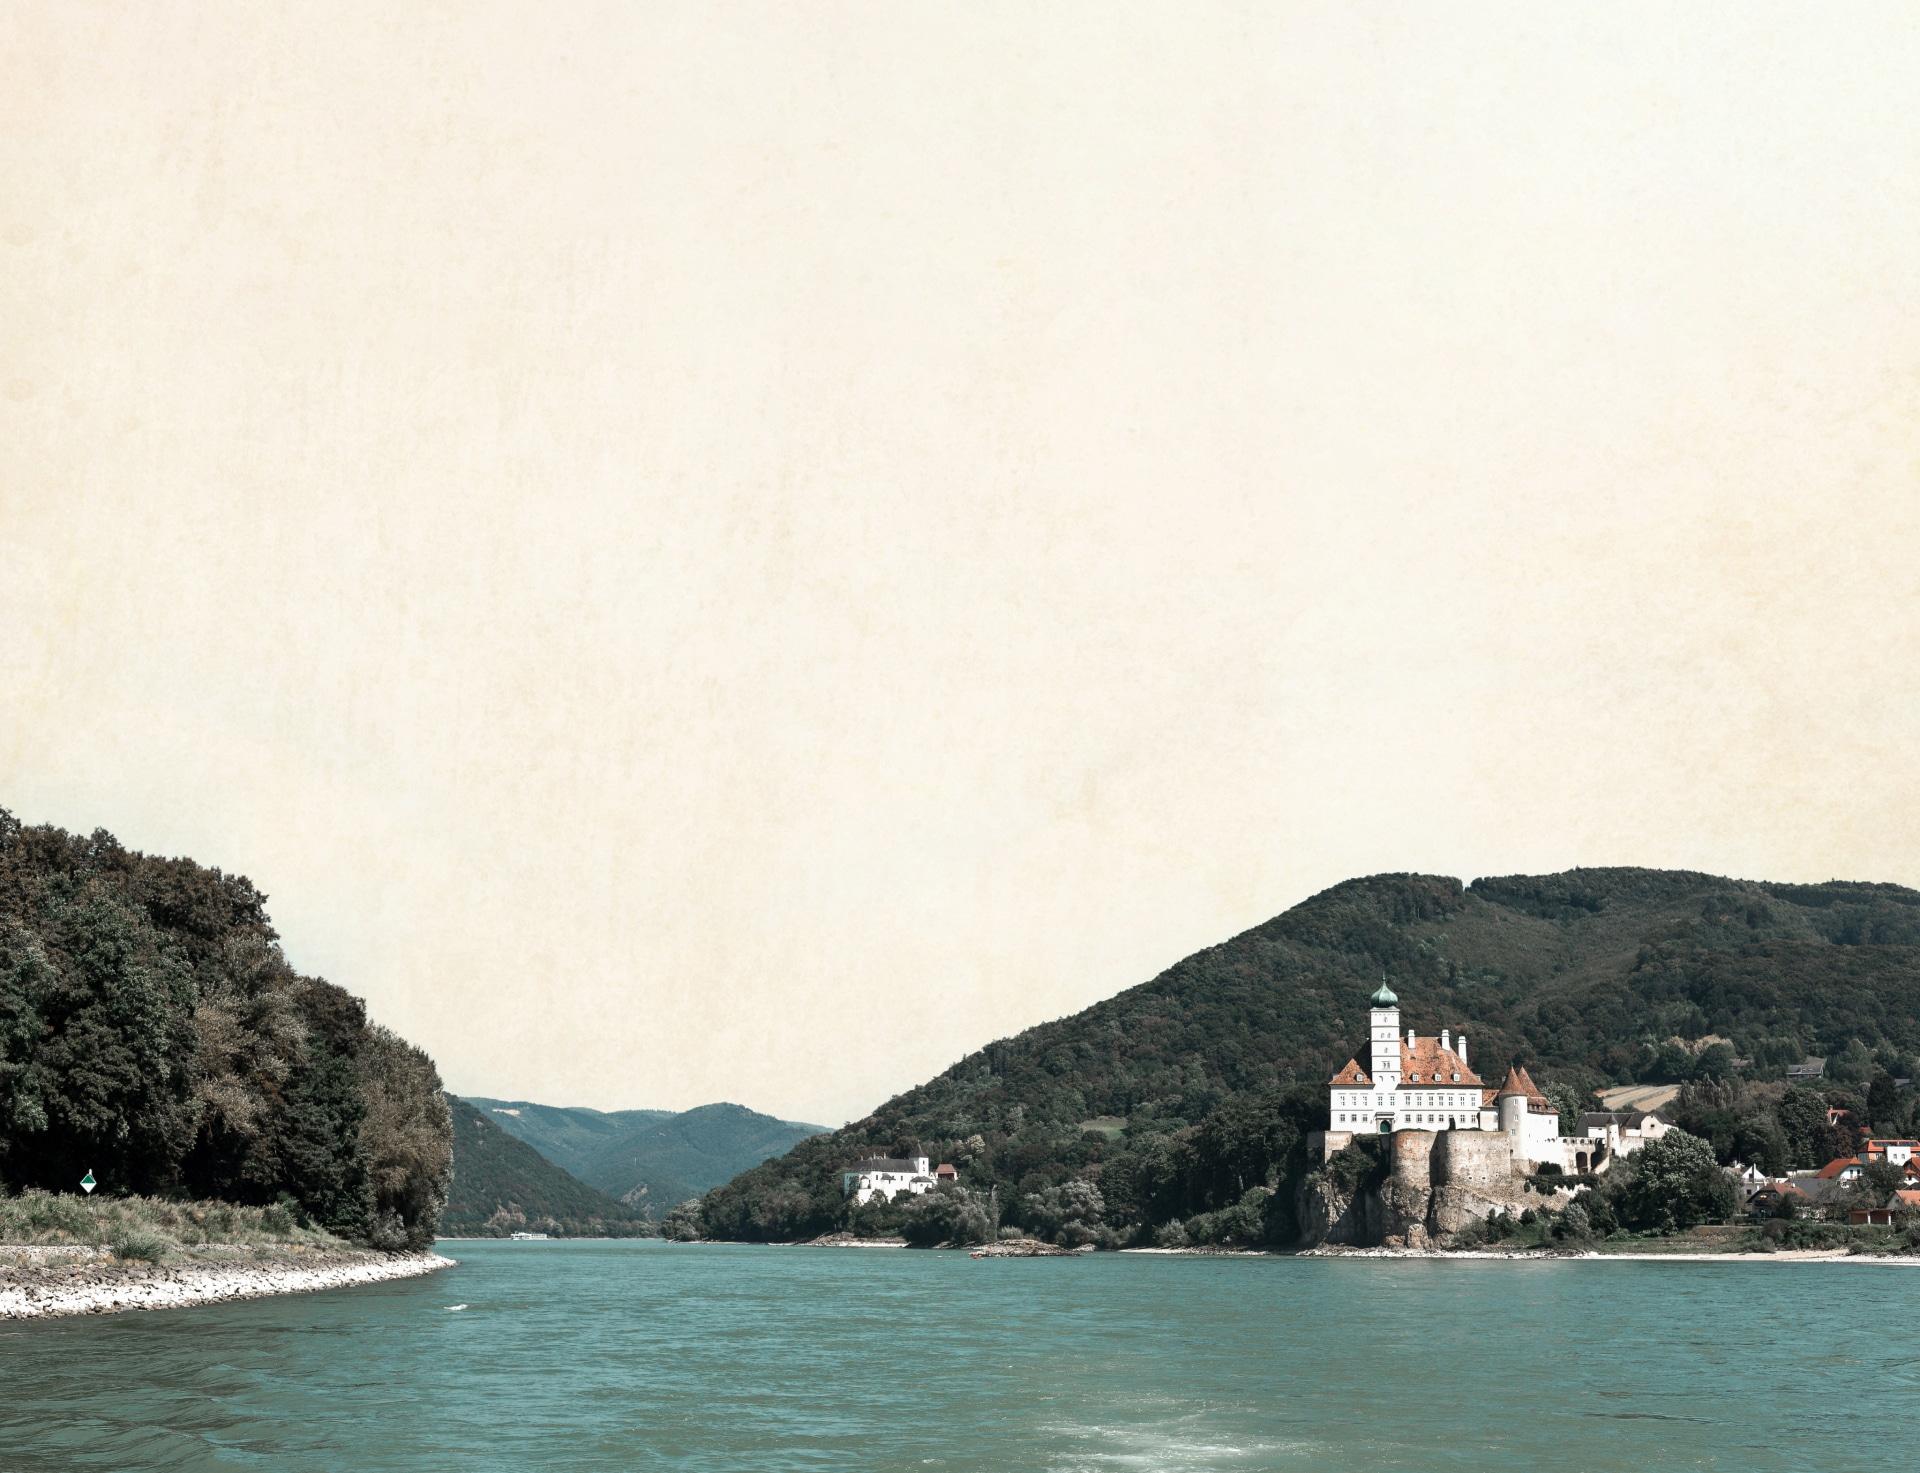 Blick auf Schloss Schönbühel